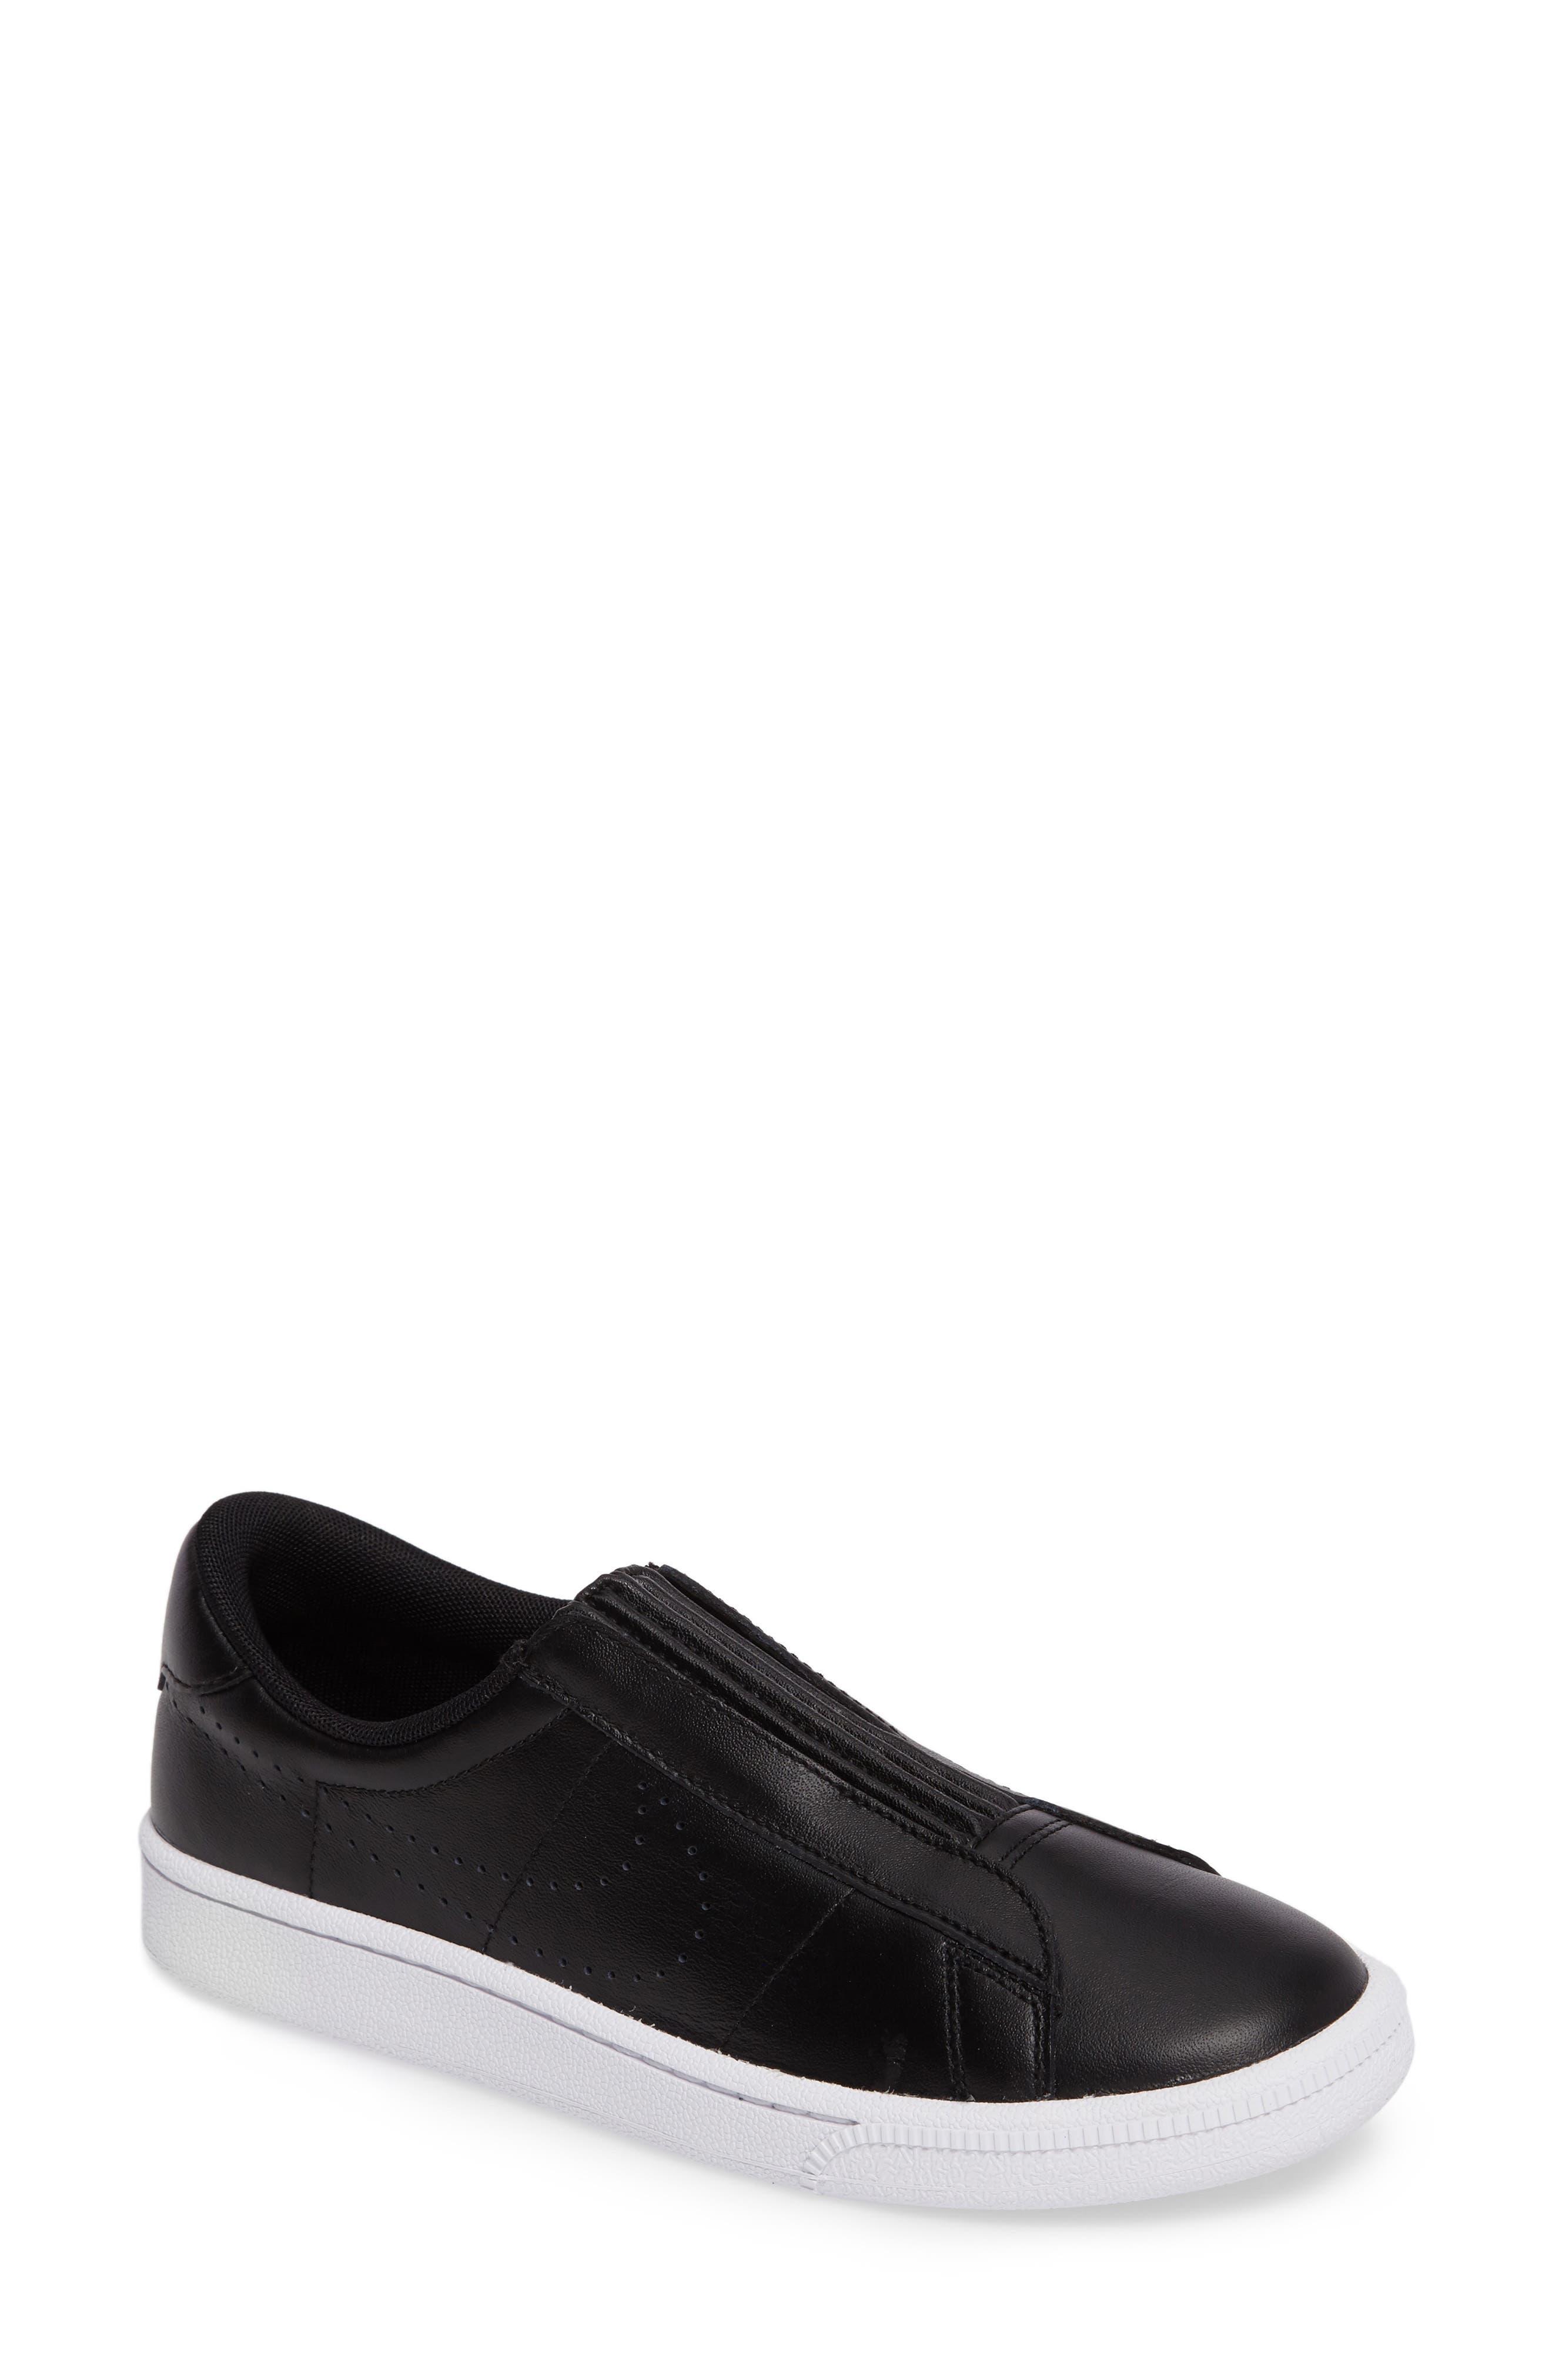 nike classic ez slip on tennis shoe nordstrom